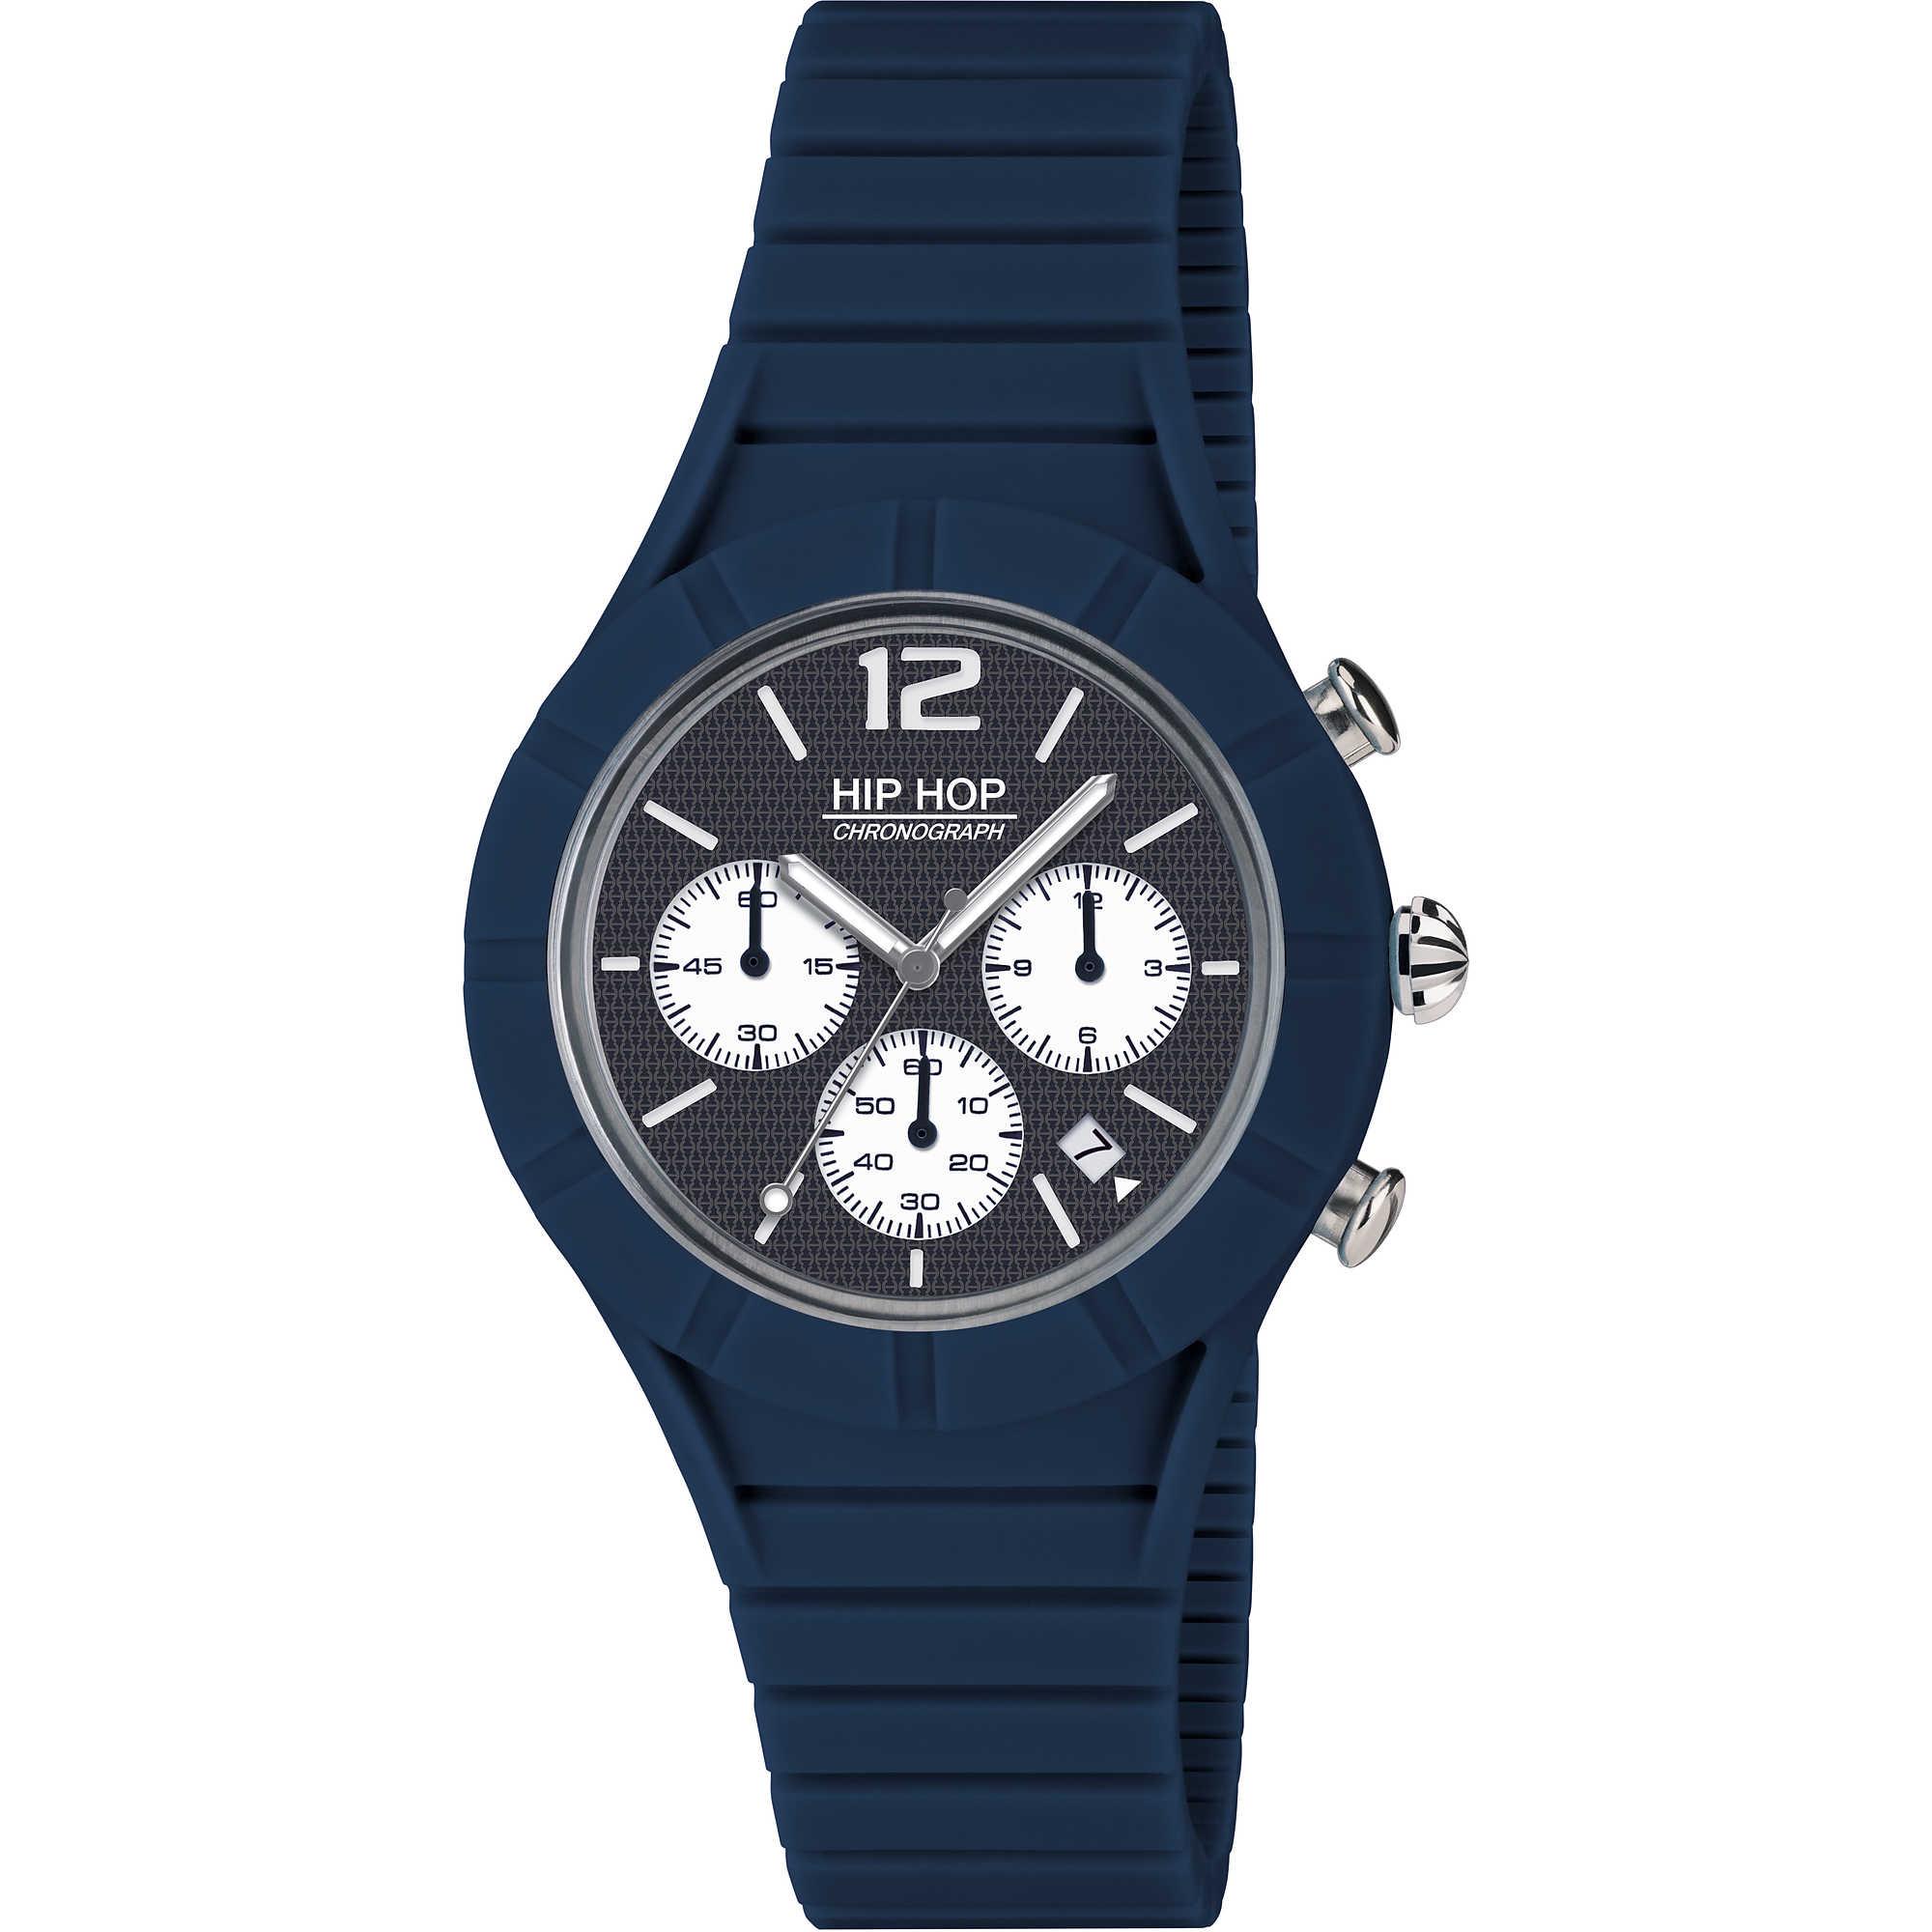 Orologio multifunzione uomo hip hop x man hwu0658 for Pietro milano orologi